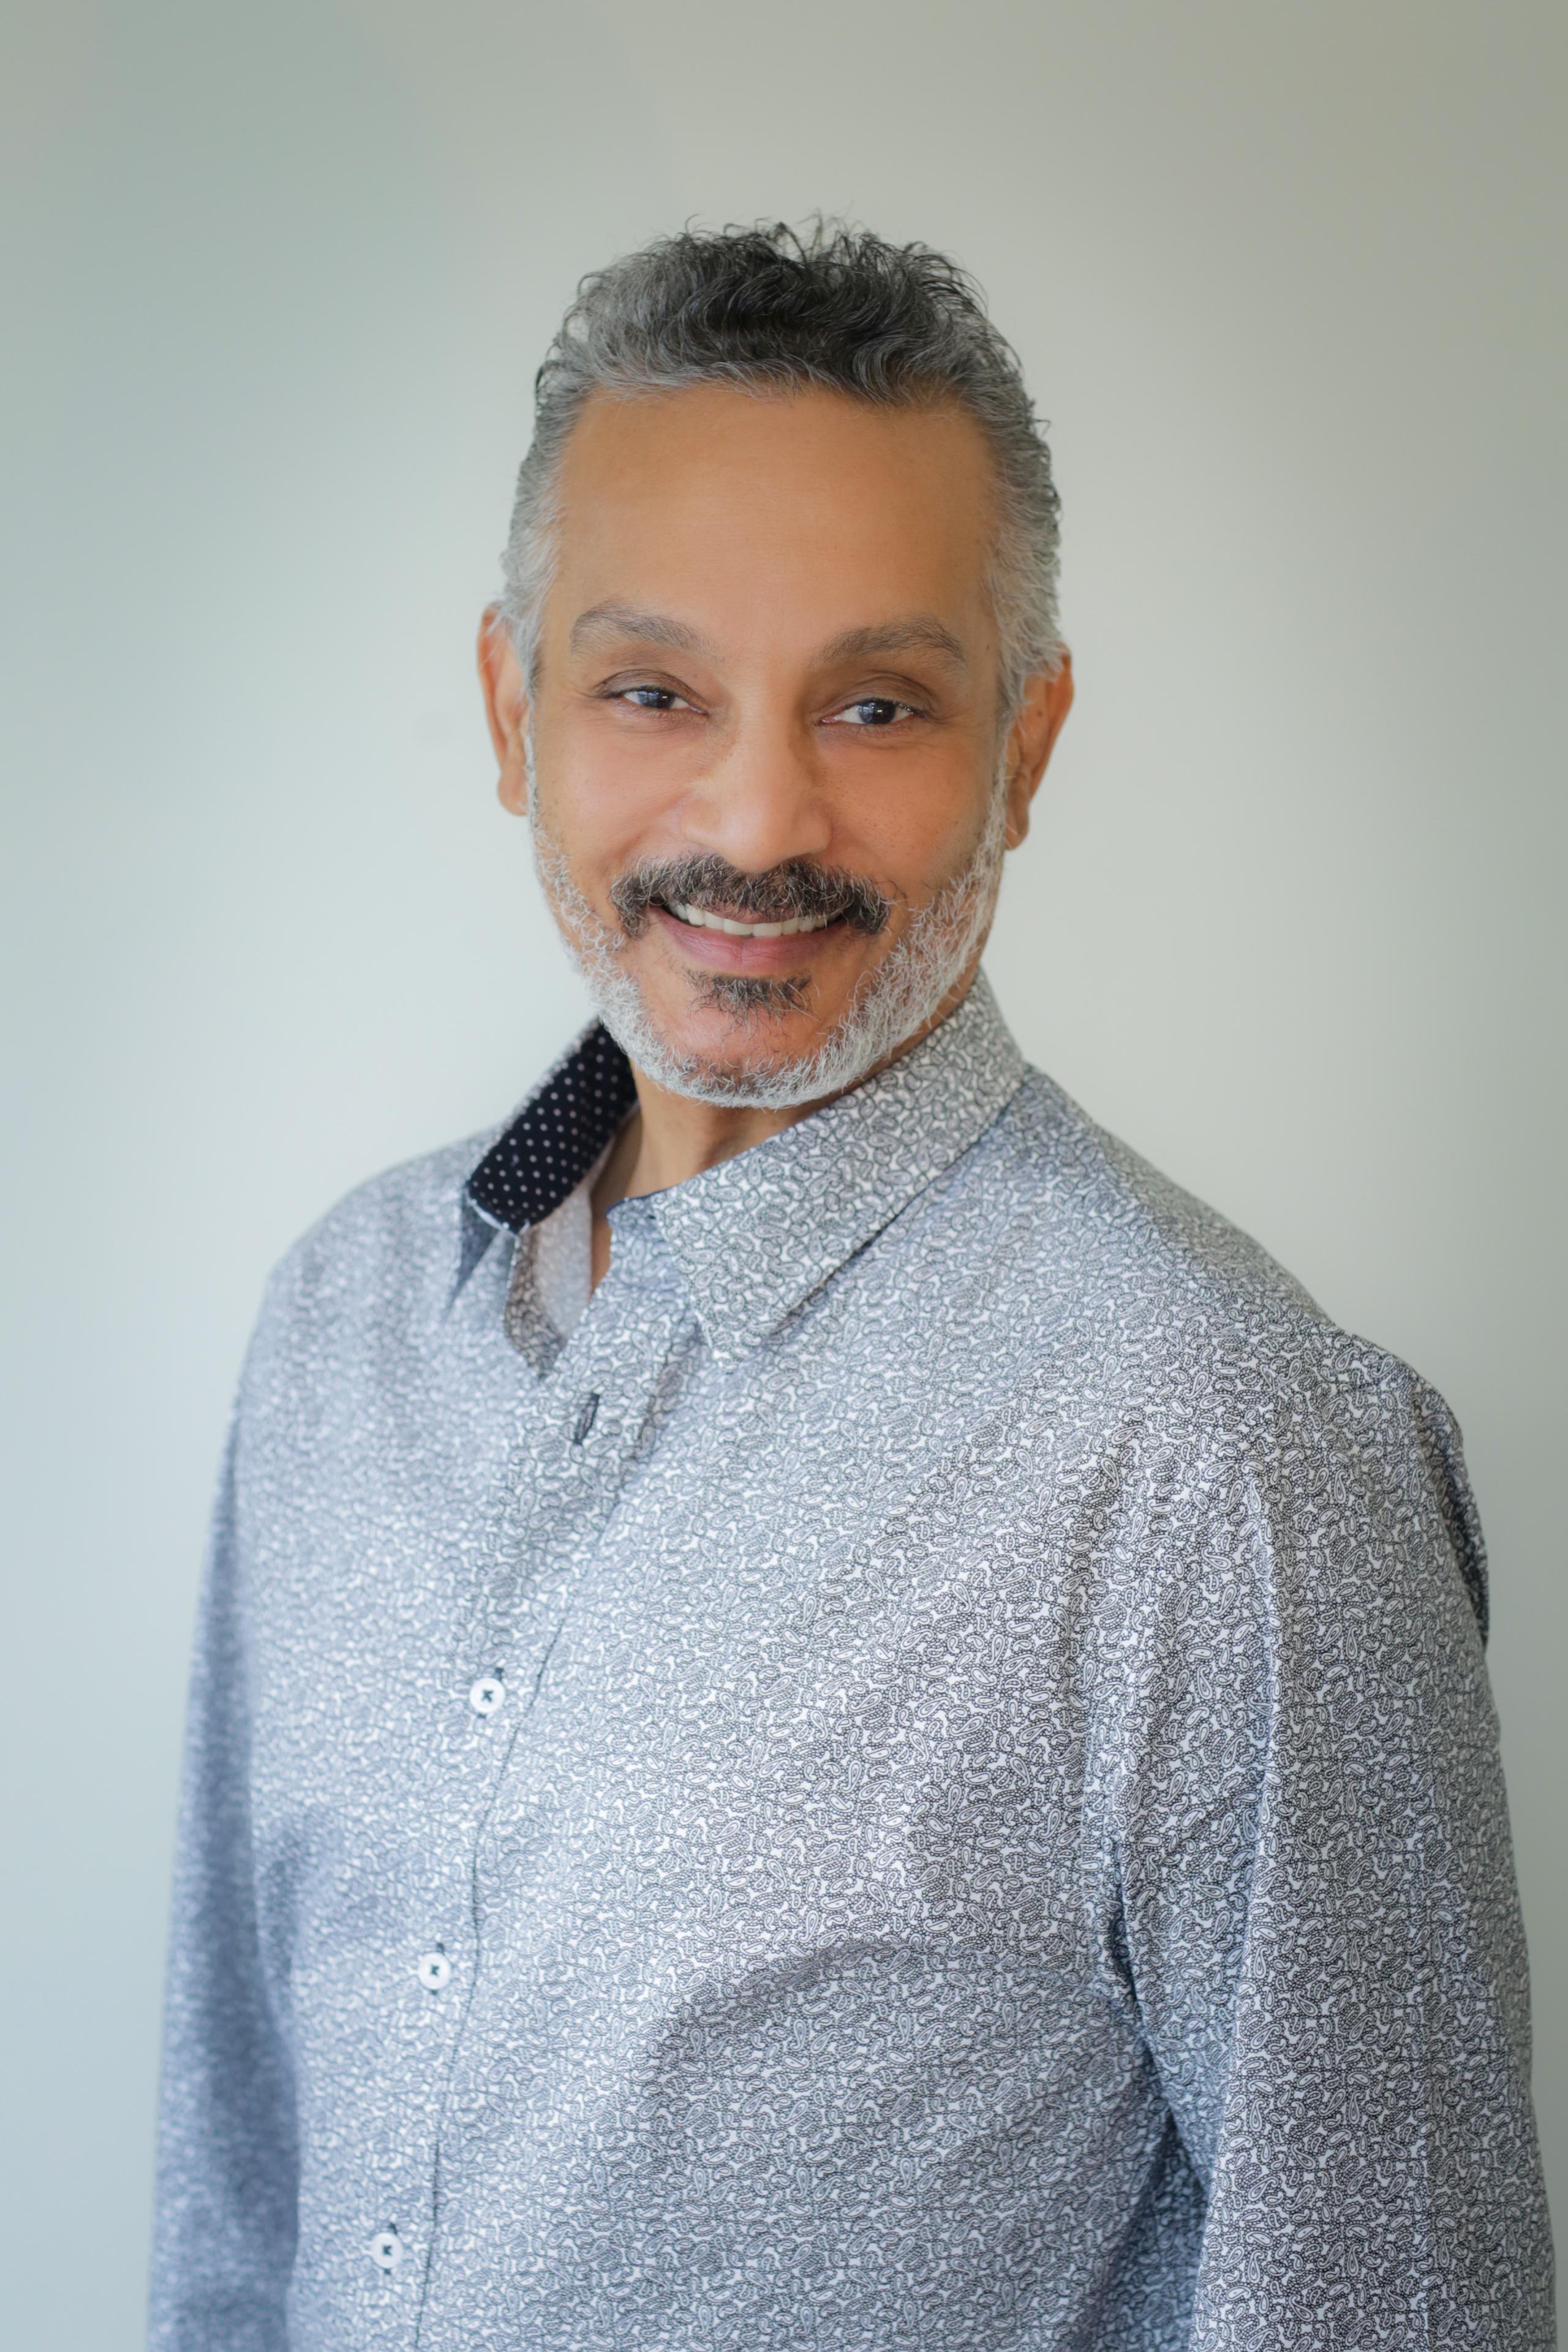 Clay Turner, Director of Facilities